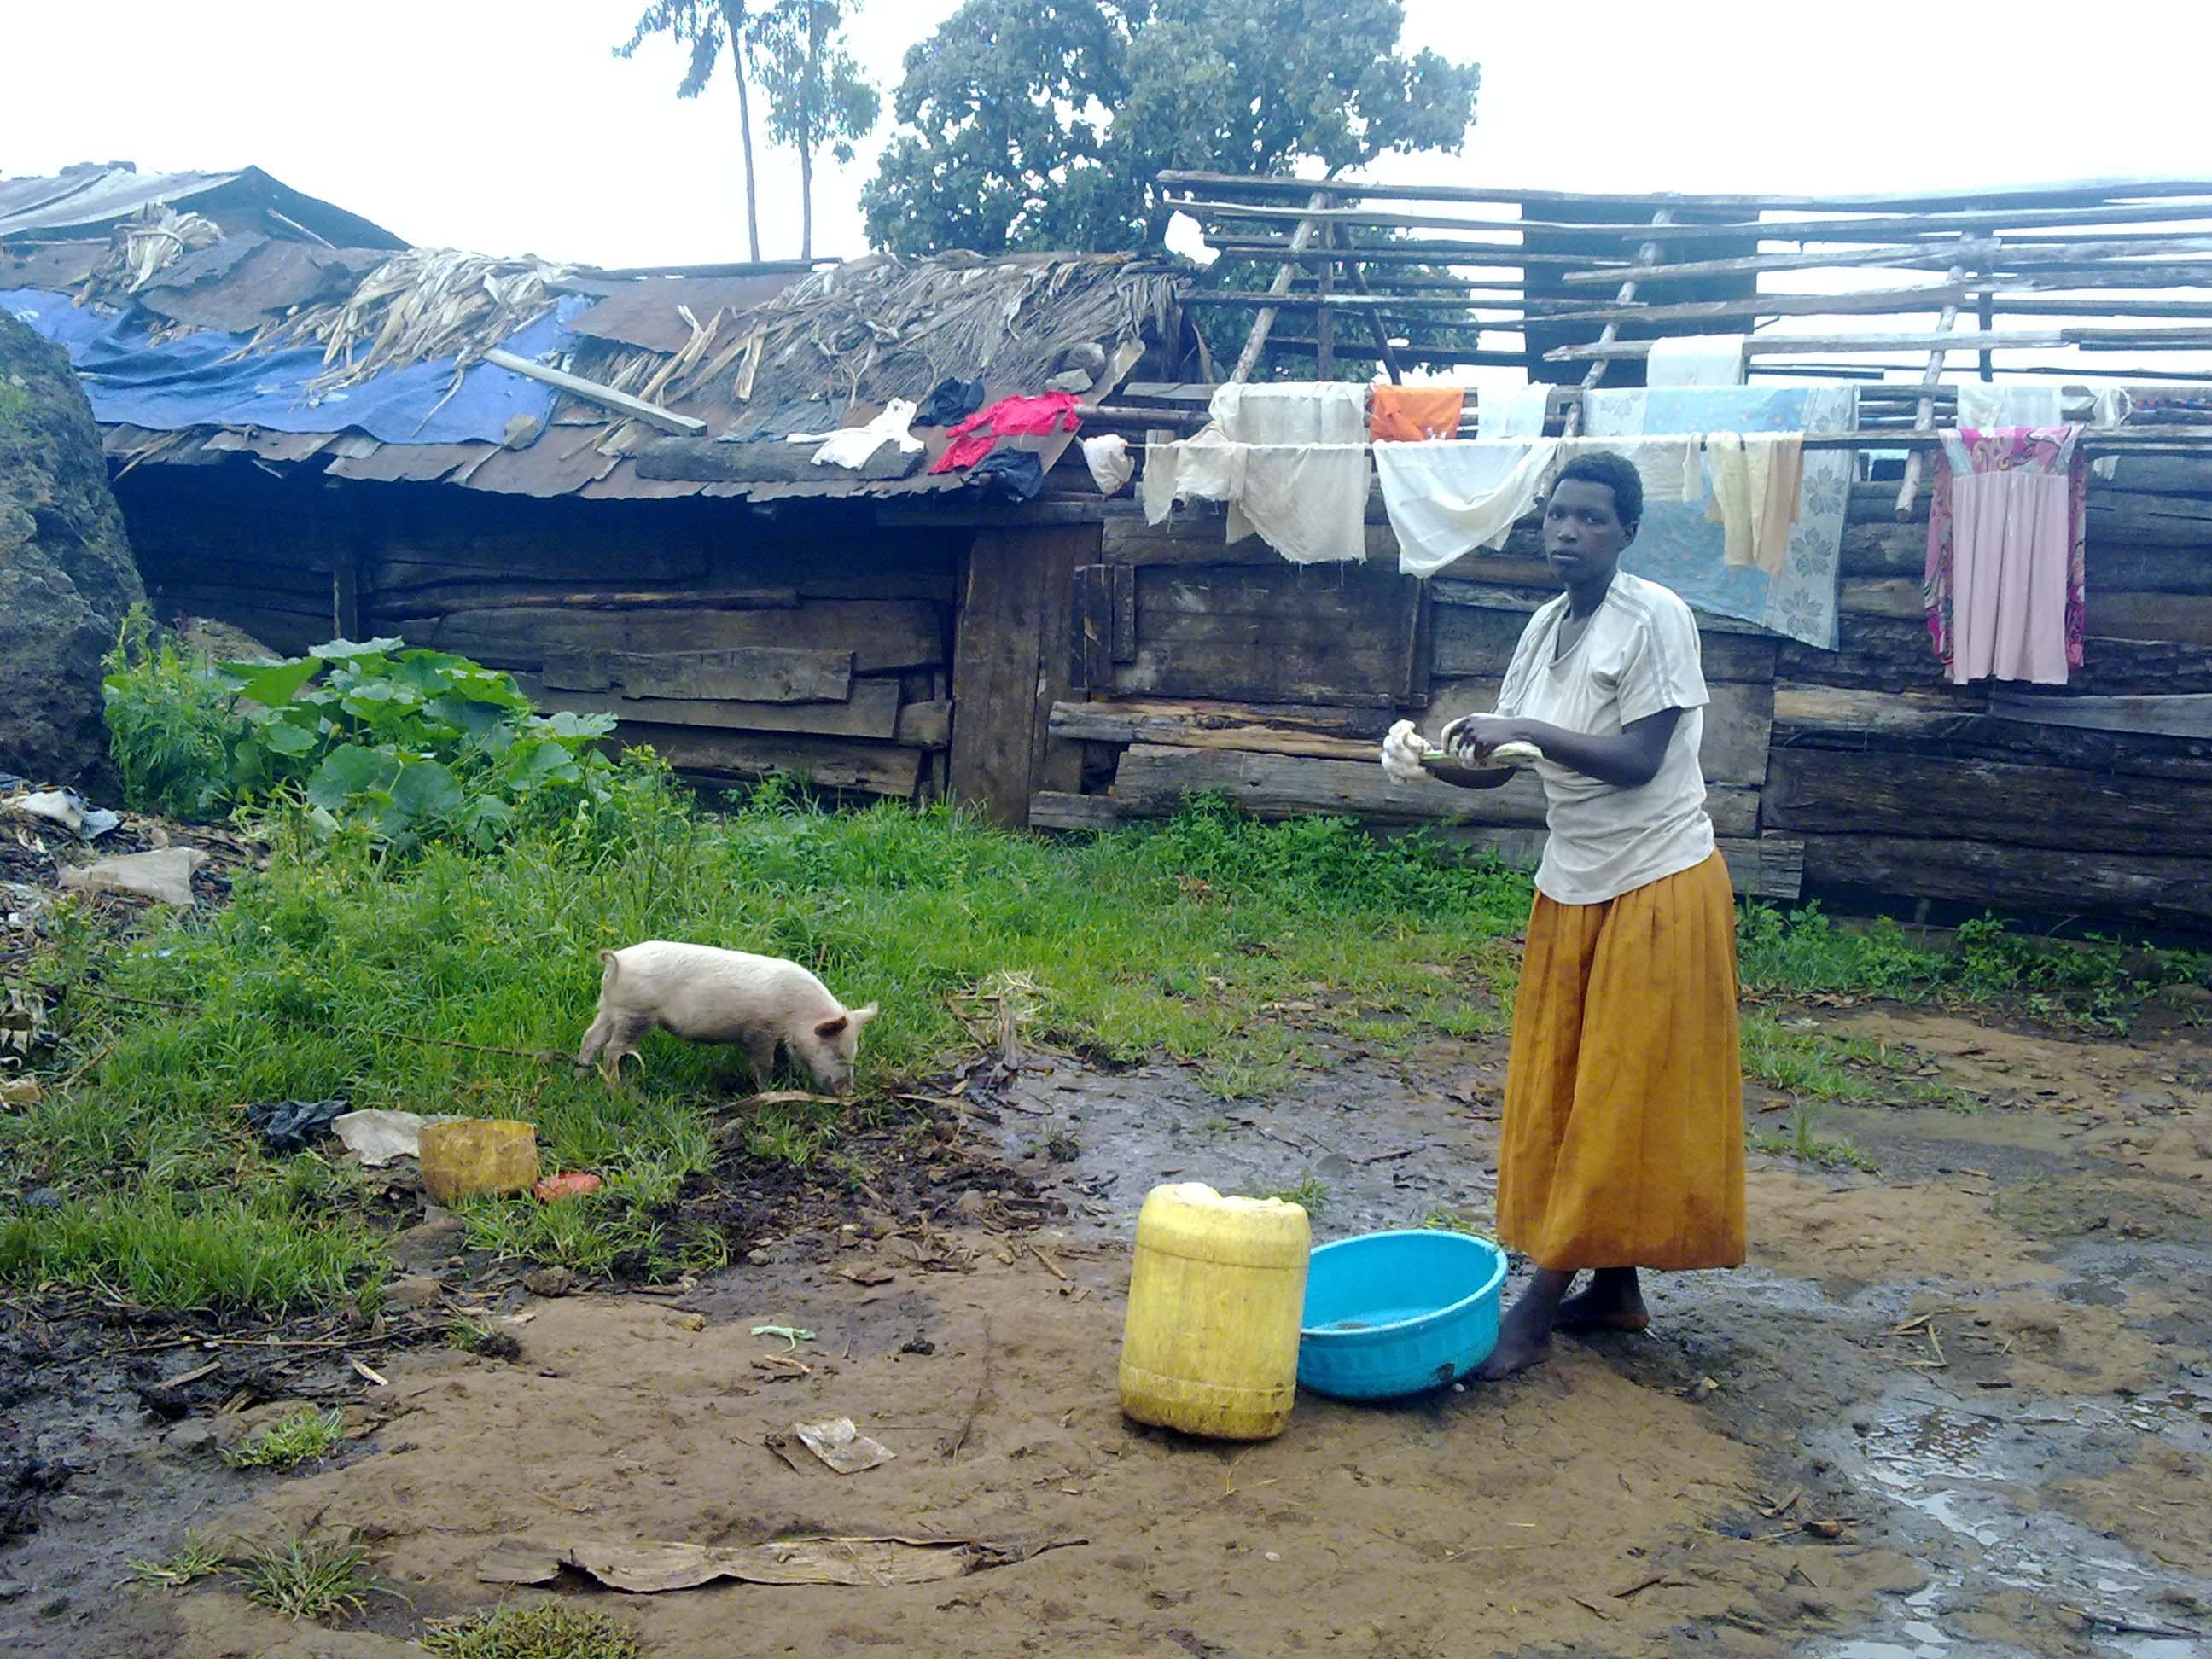 Chemutai washes here clothes at the Rwanda camp in Kween District. Photo by Daudi Nana.